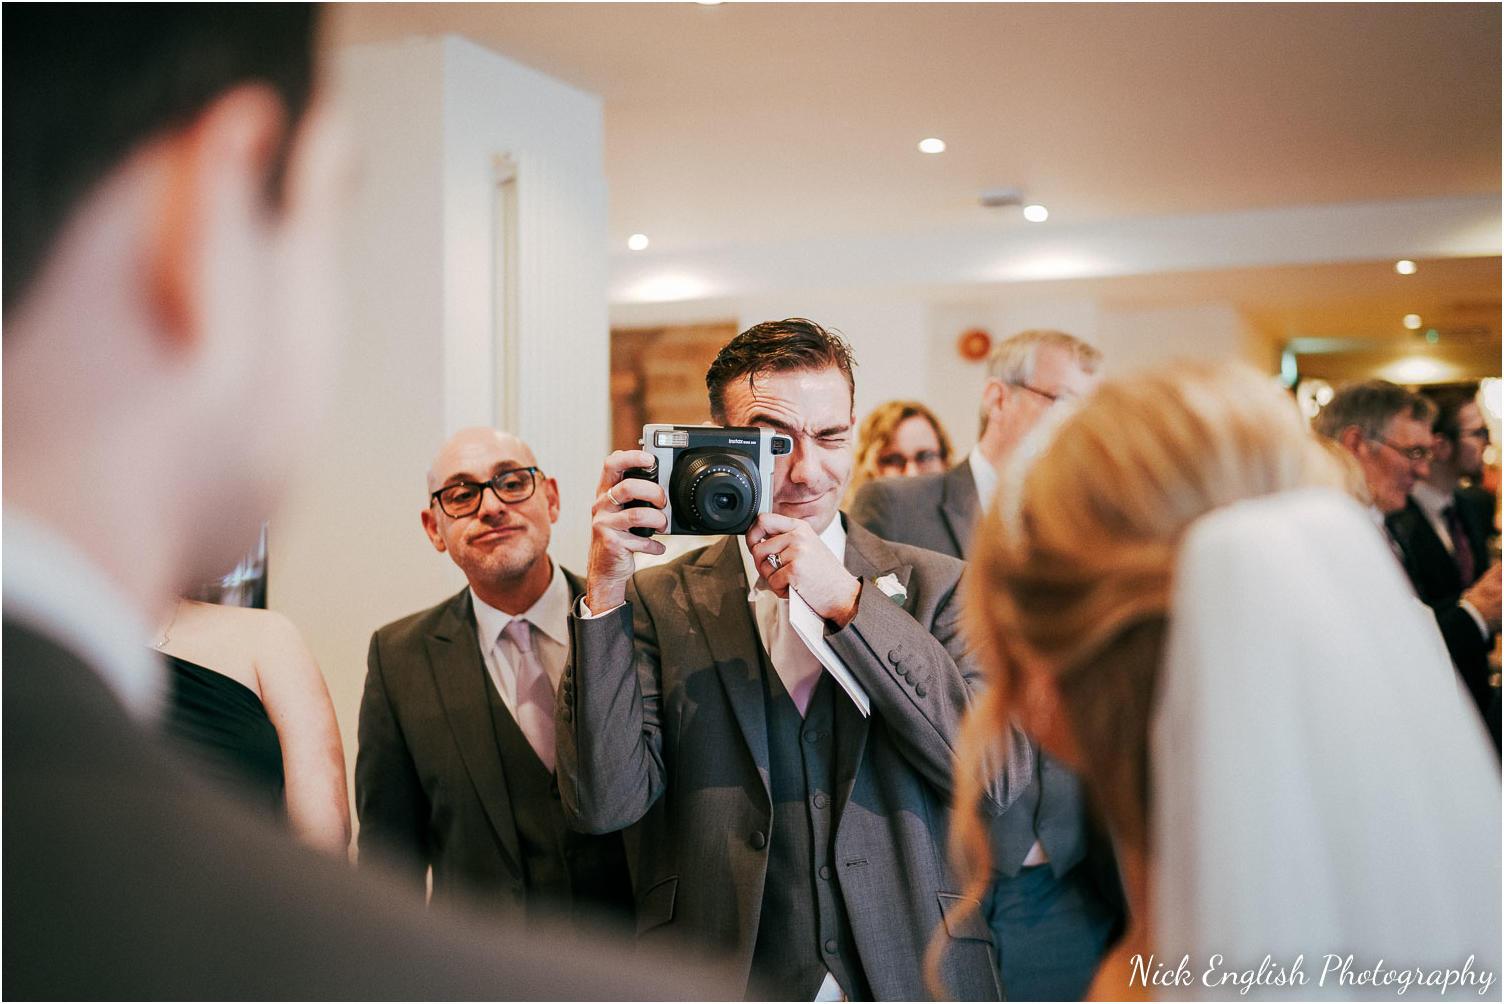 Mitton_Hall_Wedding_Photographer_2018-105.jpg